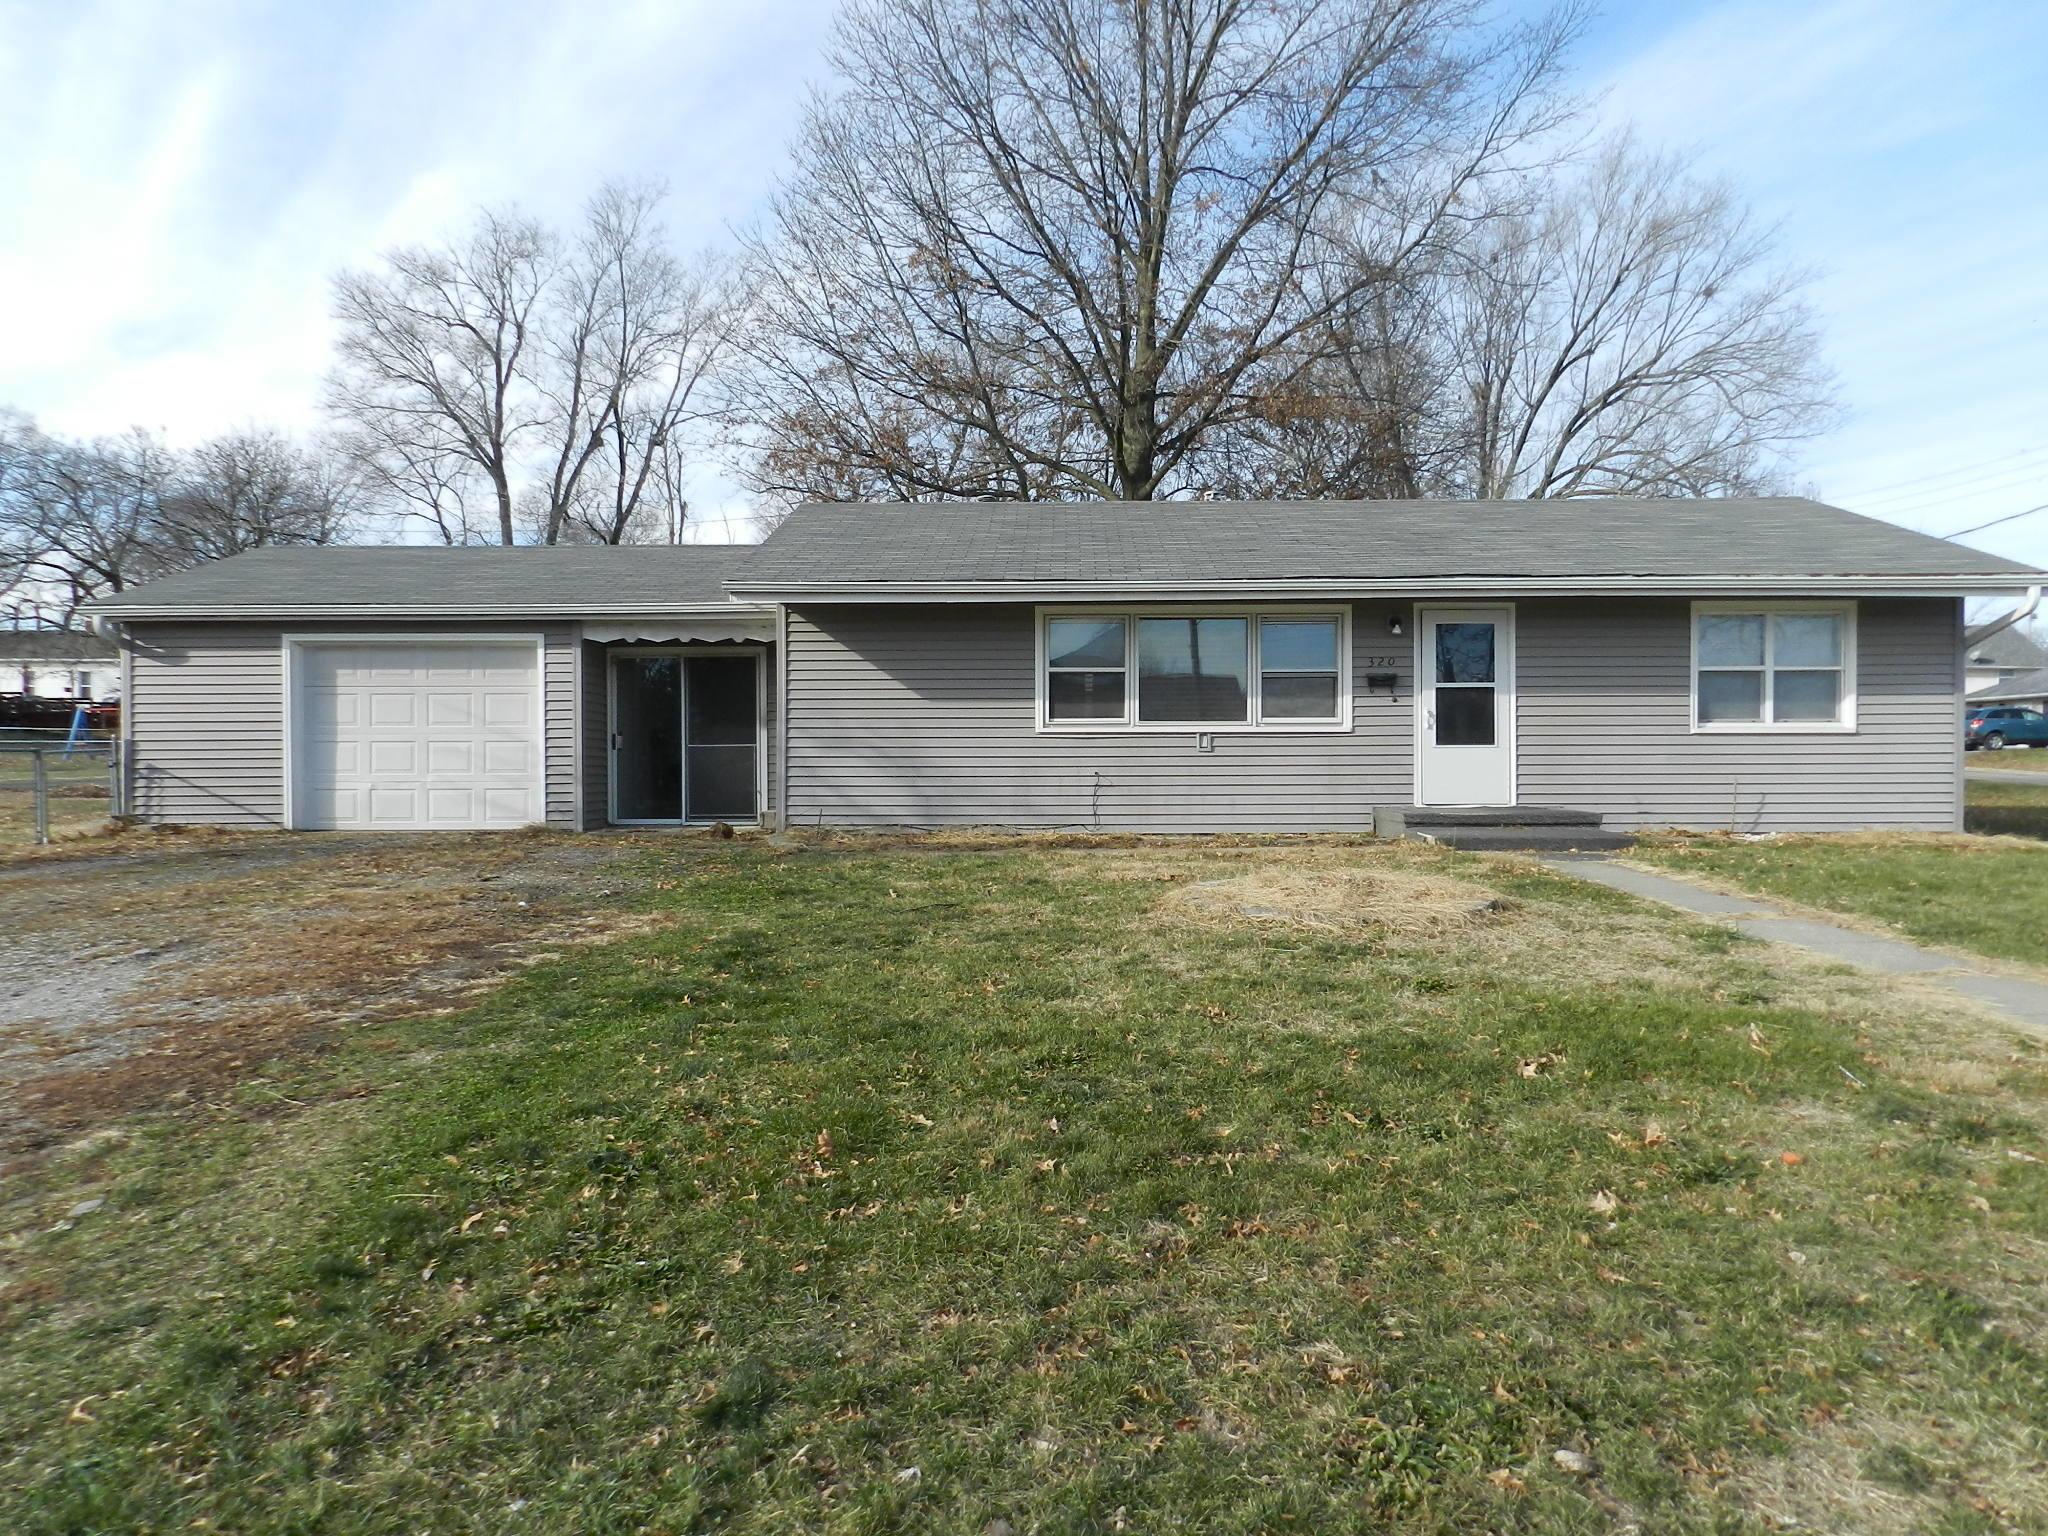 320 ALVIN Street, Maryville, Missouri 64468, 3 Bedrooms Bedrooms, ,2 BathroomsBathrooms,Residential,ALVIN,4894